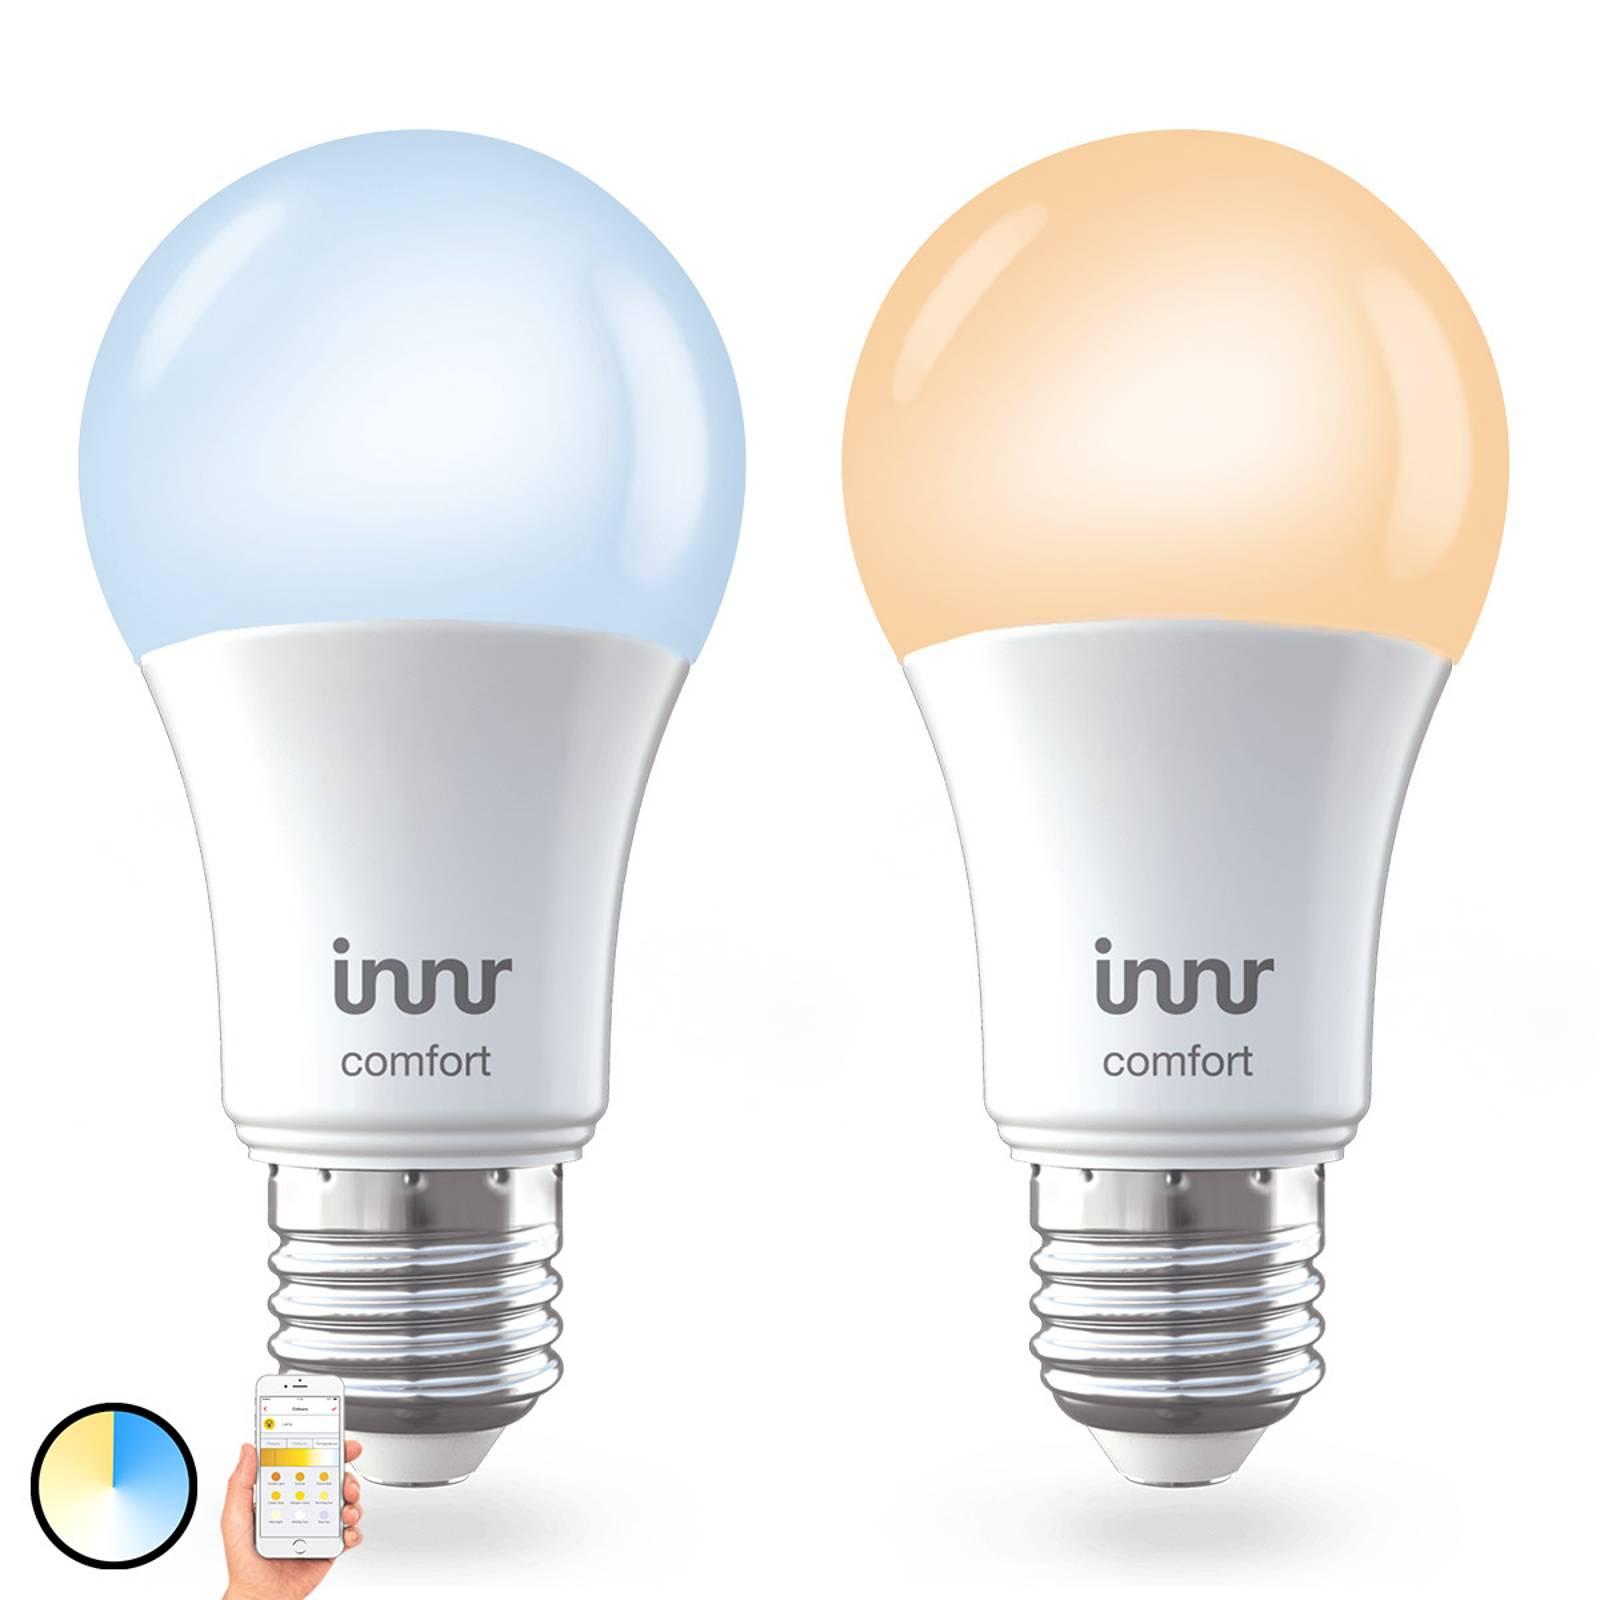 E27 9W LED-lamppu Innr Smart Bulb Comfort, 2 kpl